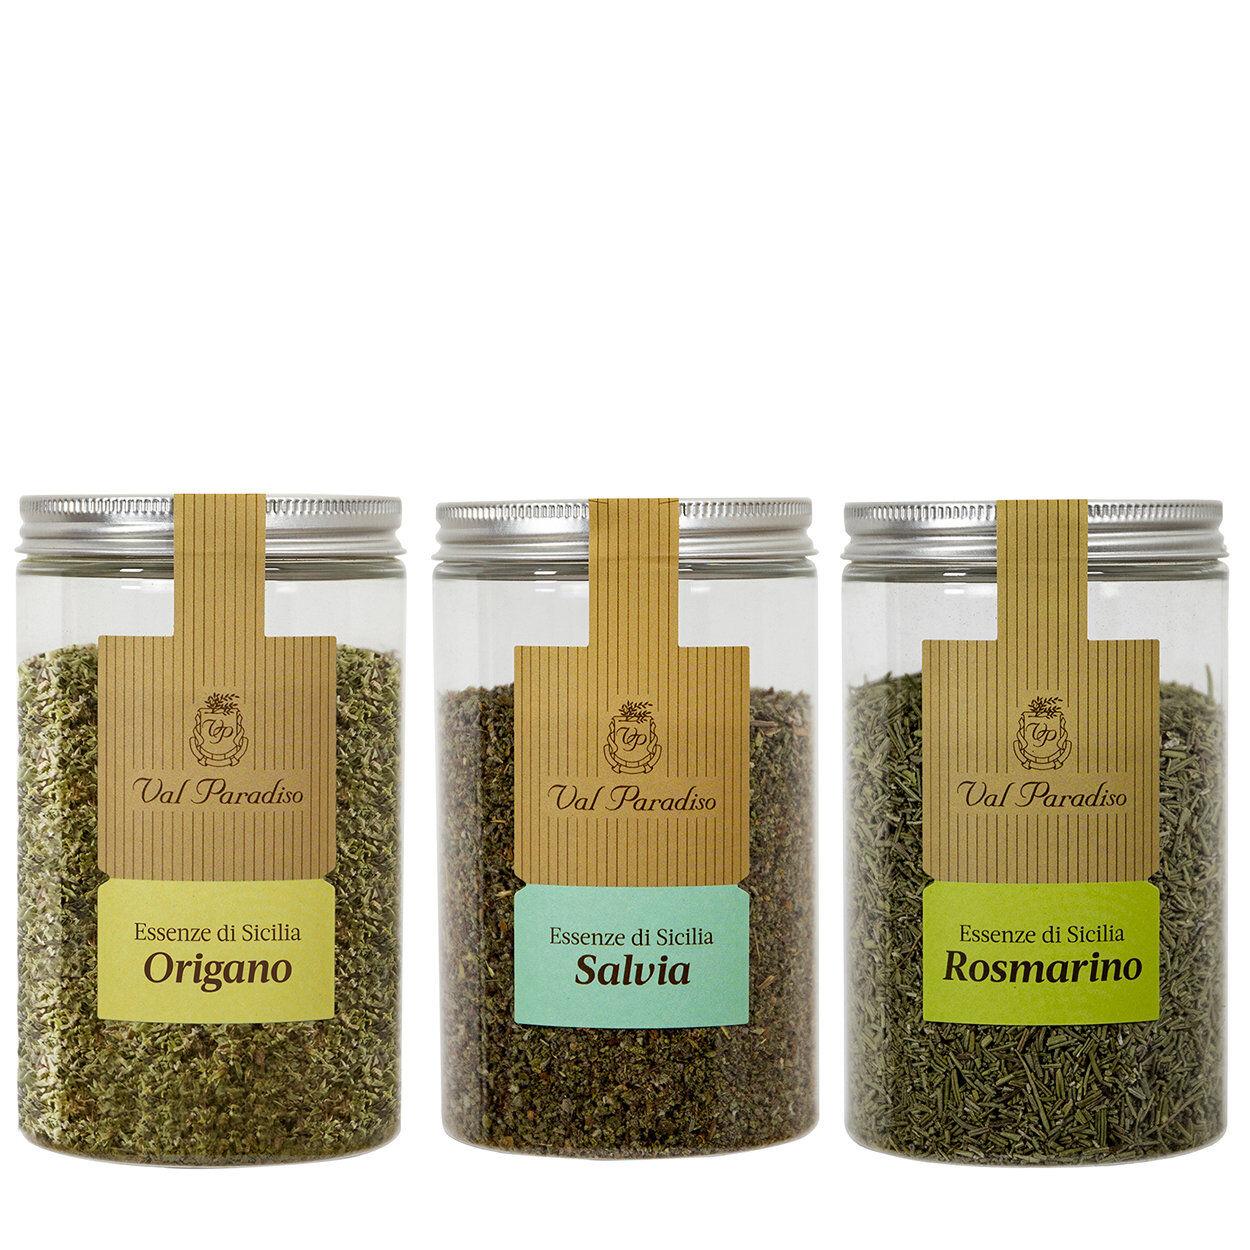 val paradiso 3 barattoli misti erbe aromatiche val paradiso: origano 50 gr - salvia 45 gr - rosmarino 95 gr